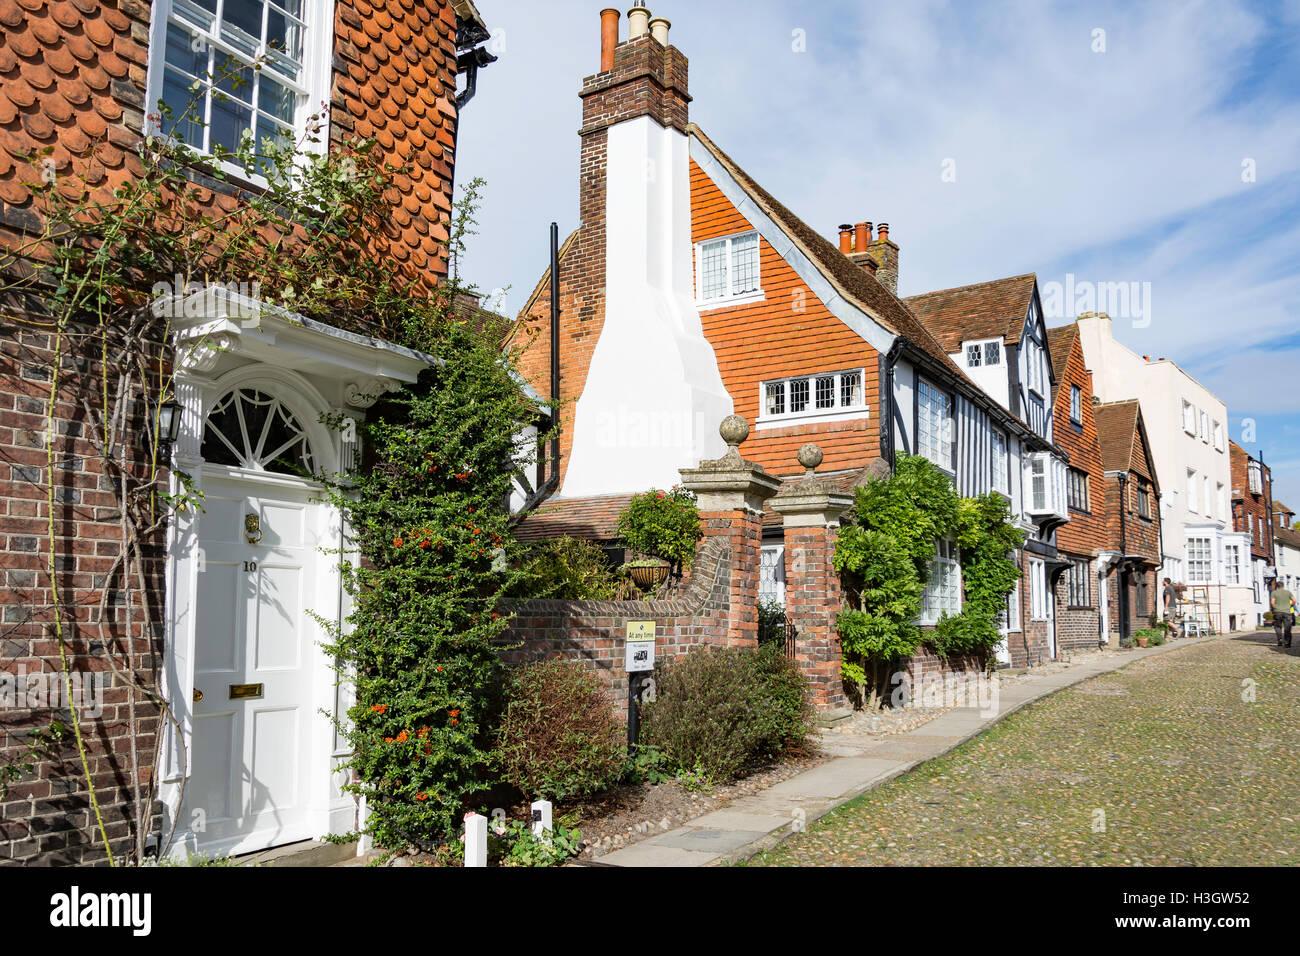 Watchbell Street, Rye, East Sussex, England, United Kingdom - Stock Image